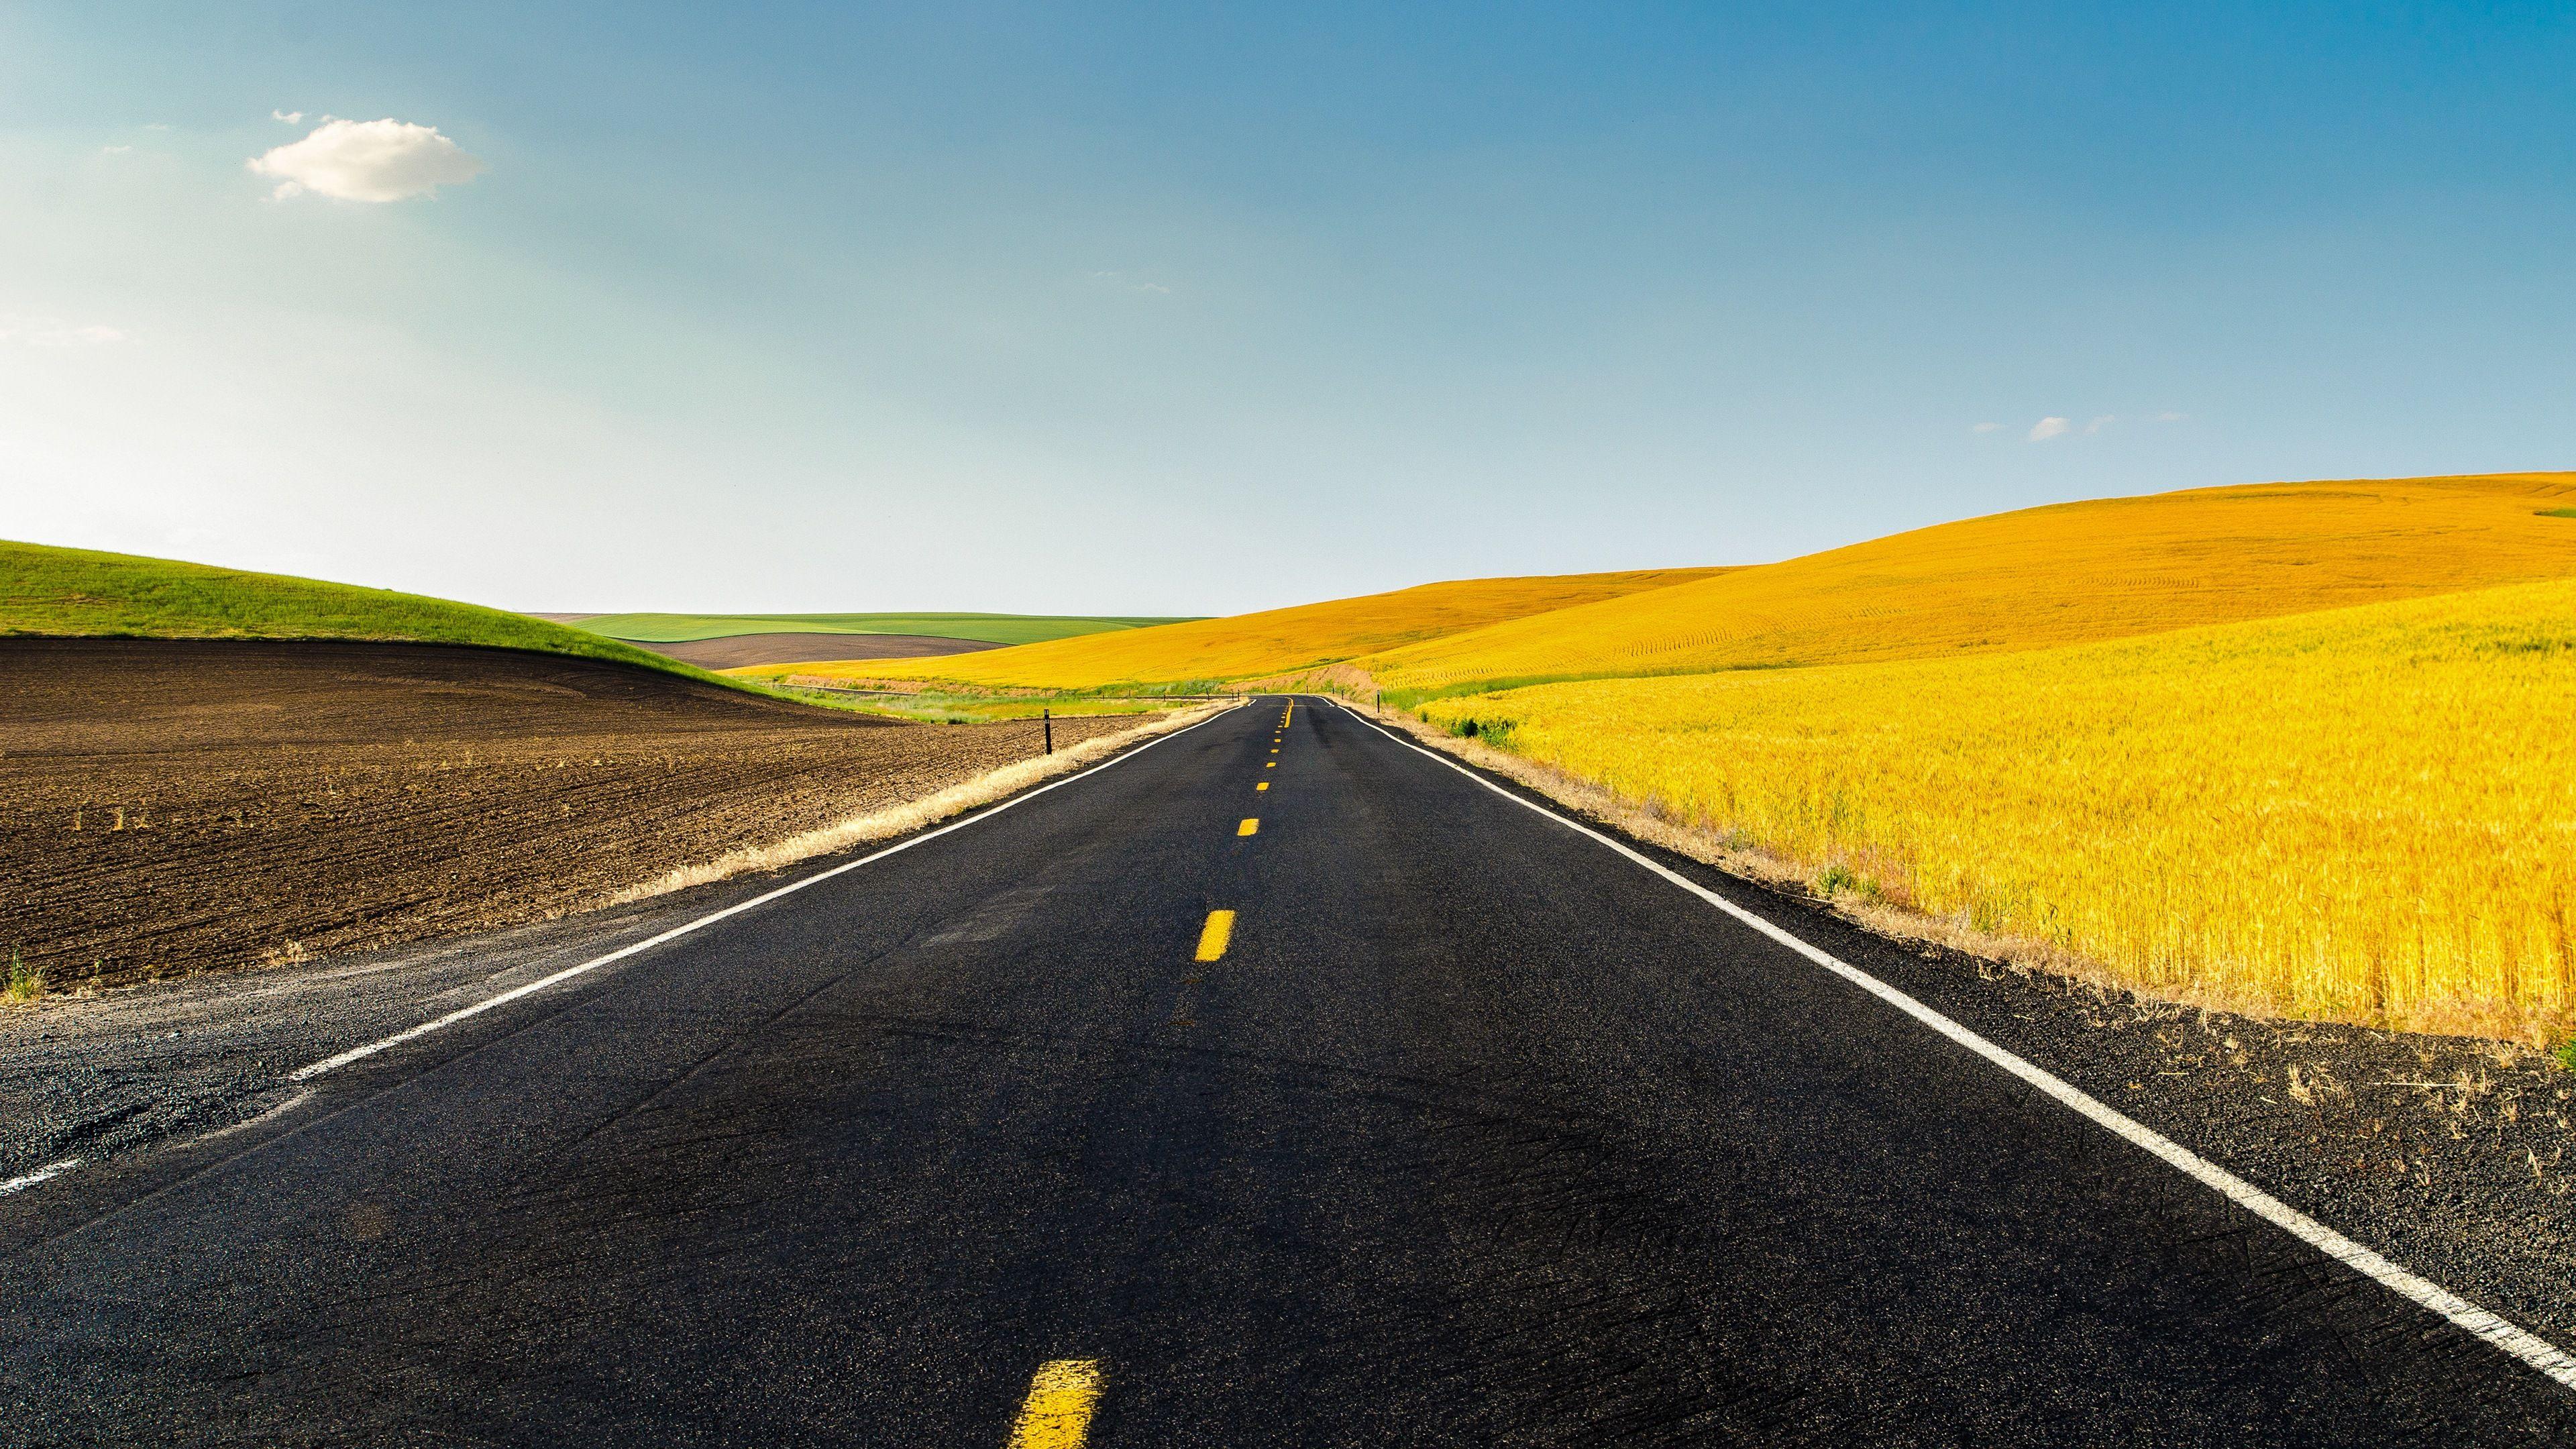 Landscape 4K Ultra HD Wallpaper | Road Through Farmland 4K ...